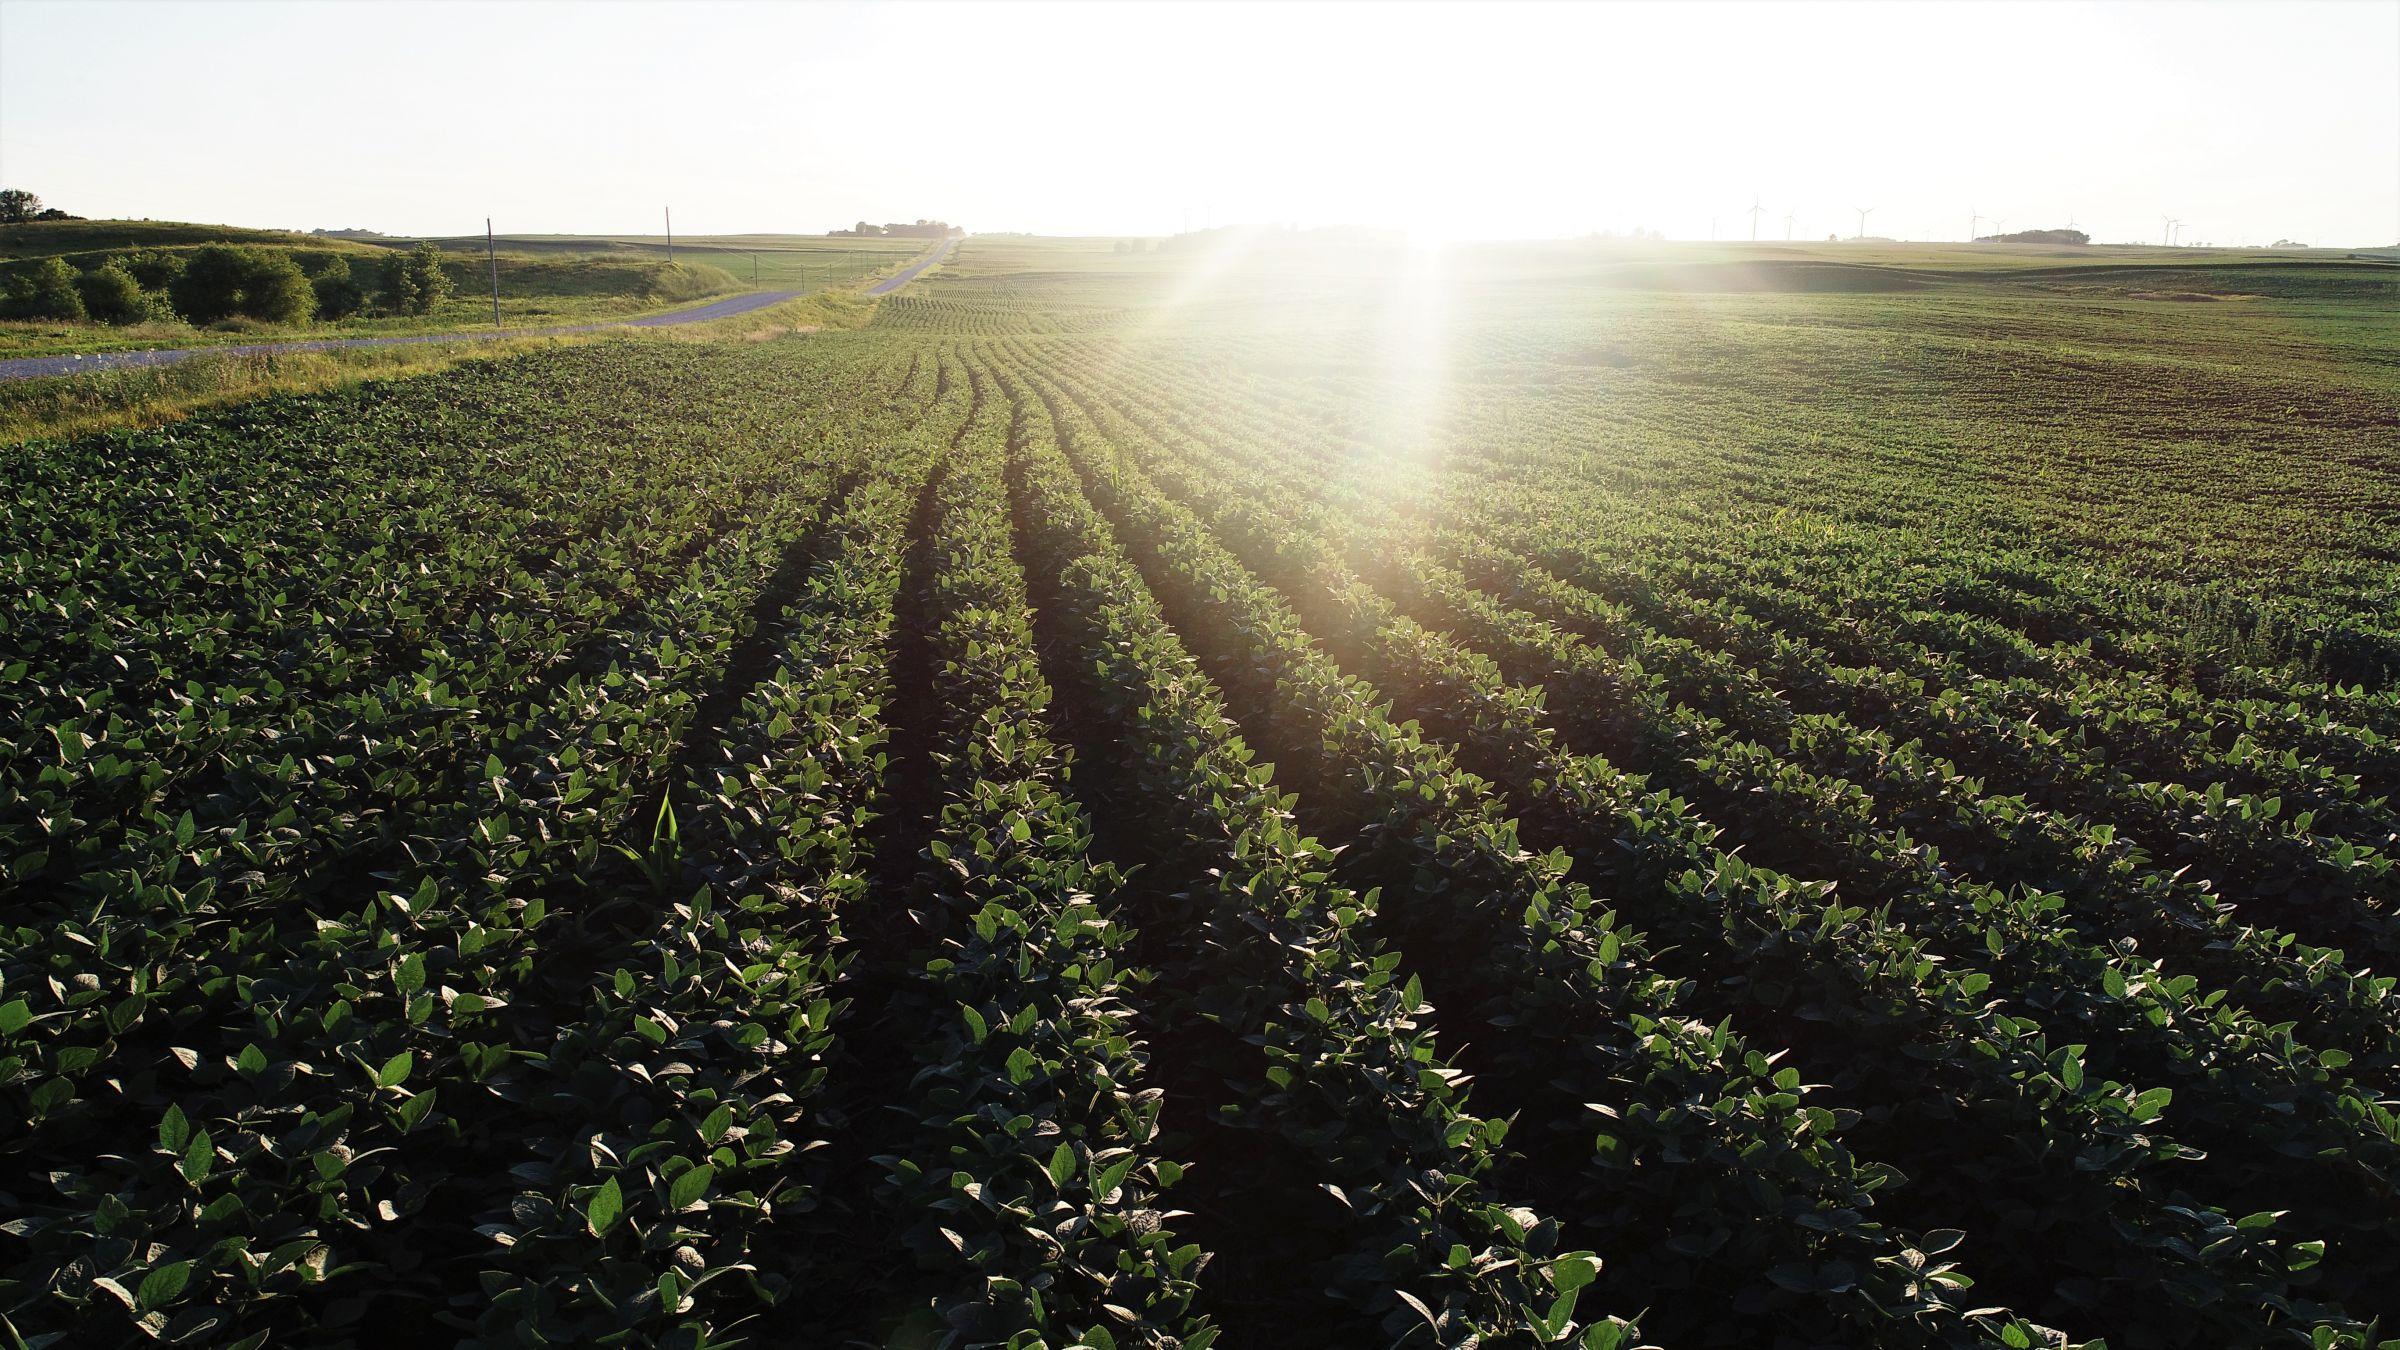 14763-cerro-gordo-farmland-for-sale-200-acres-ml-0-2019-11-07-202336.jpg